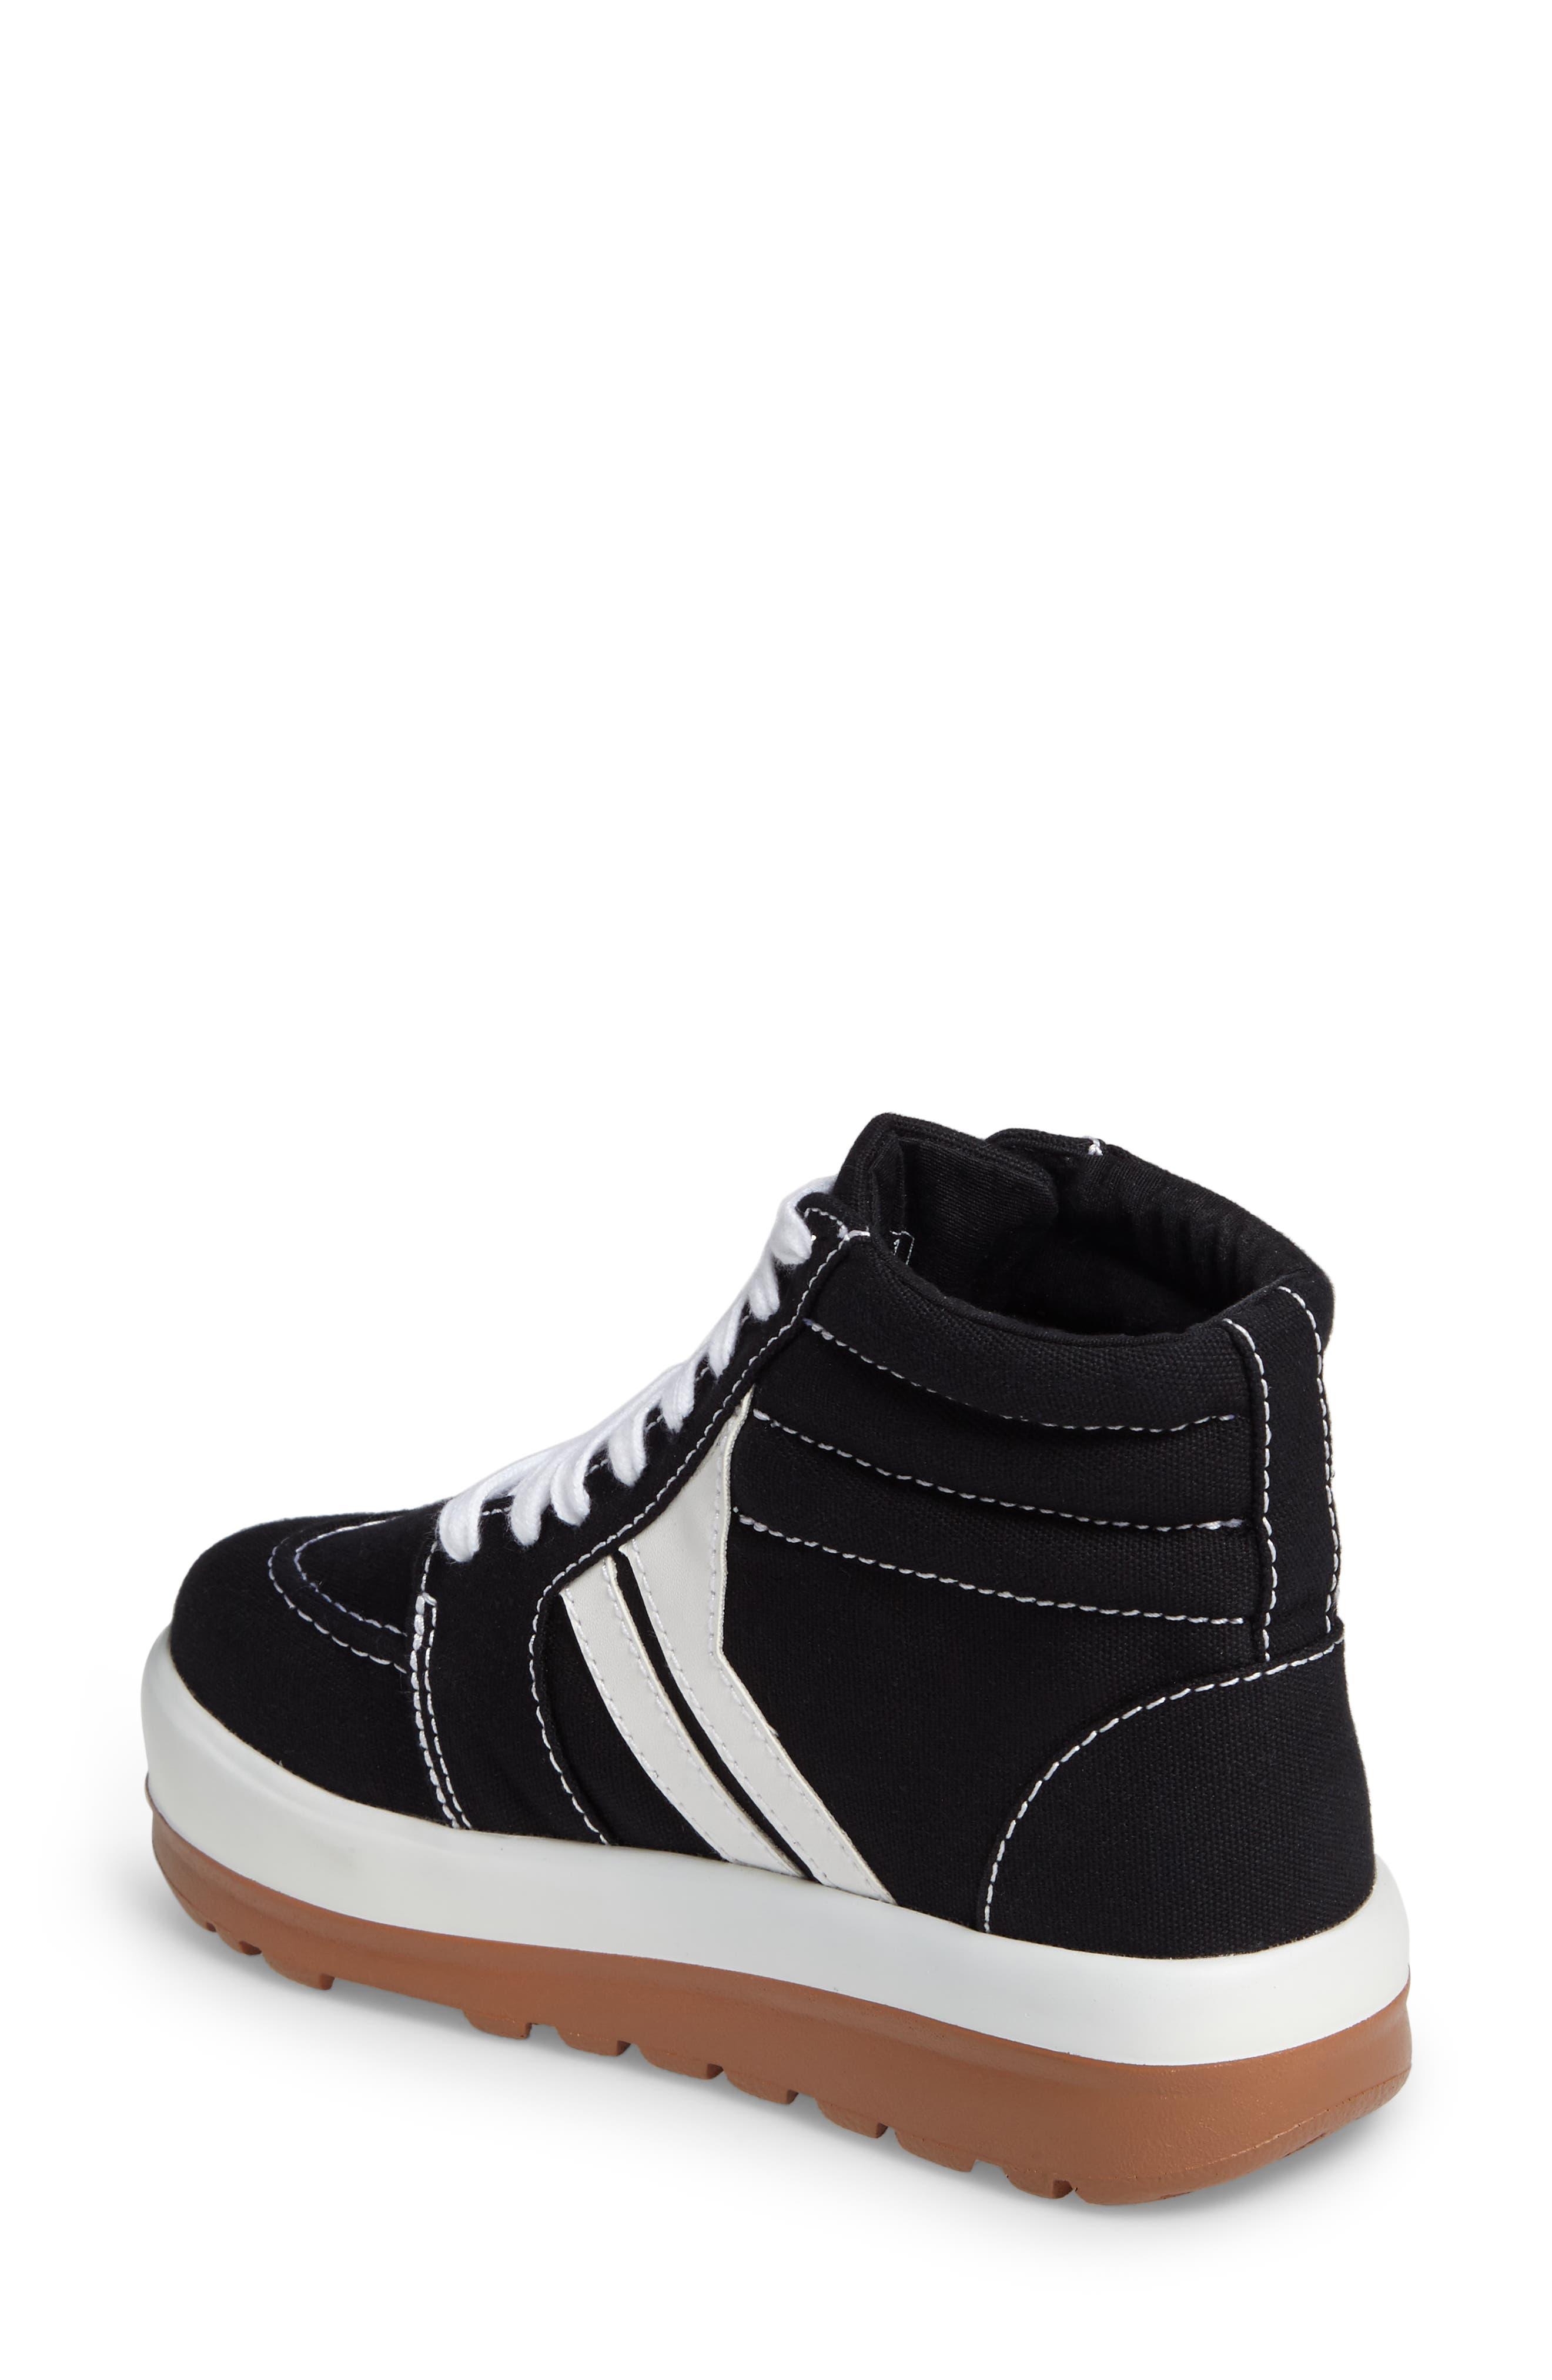 Grind High Top Sneaker,                             Alternate thumbnail 2, color,